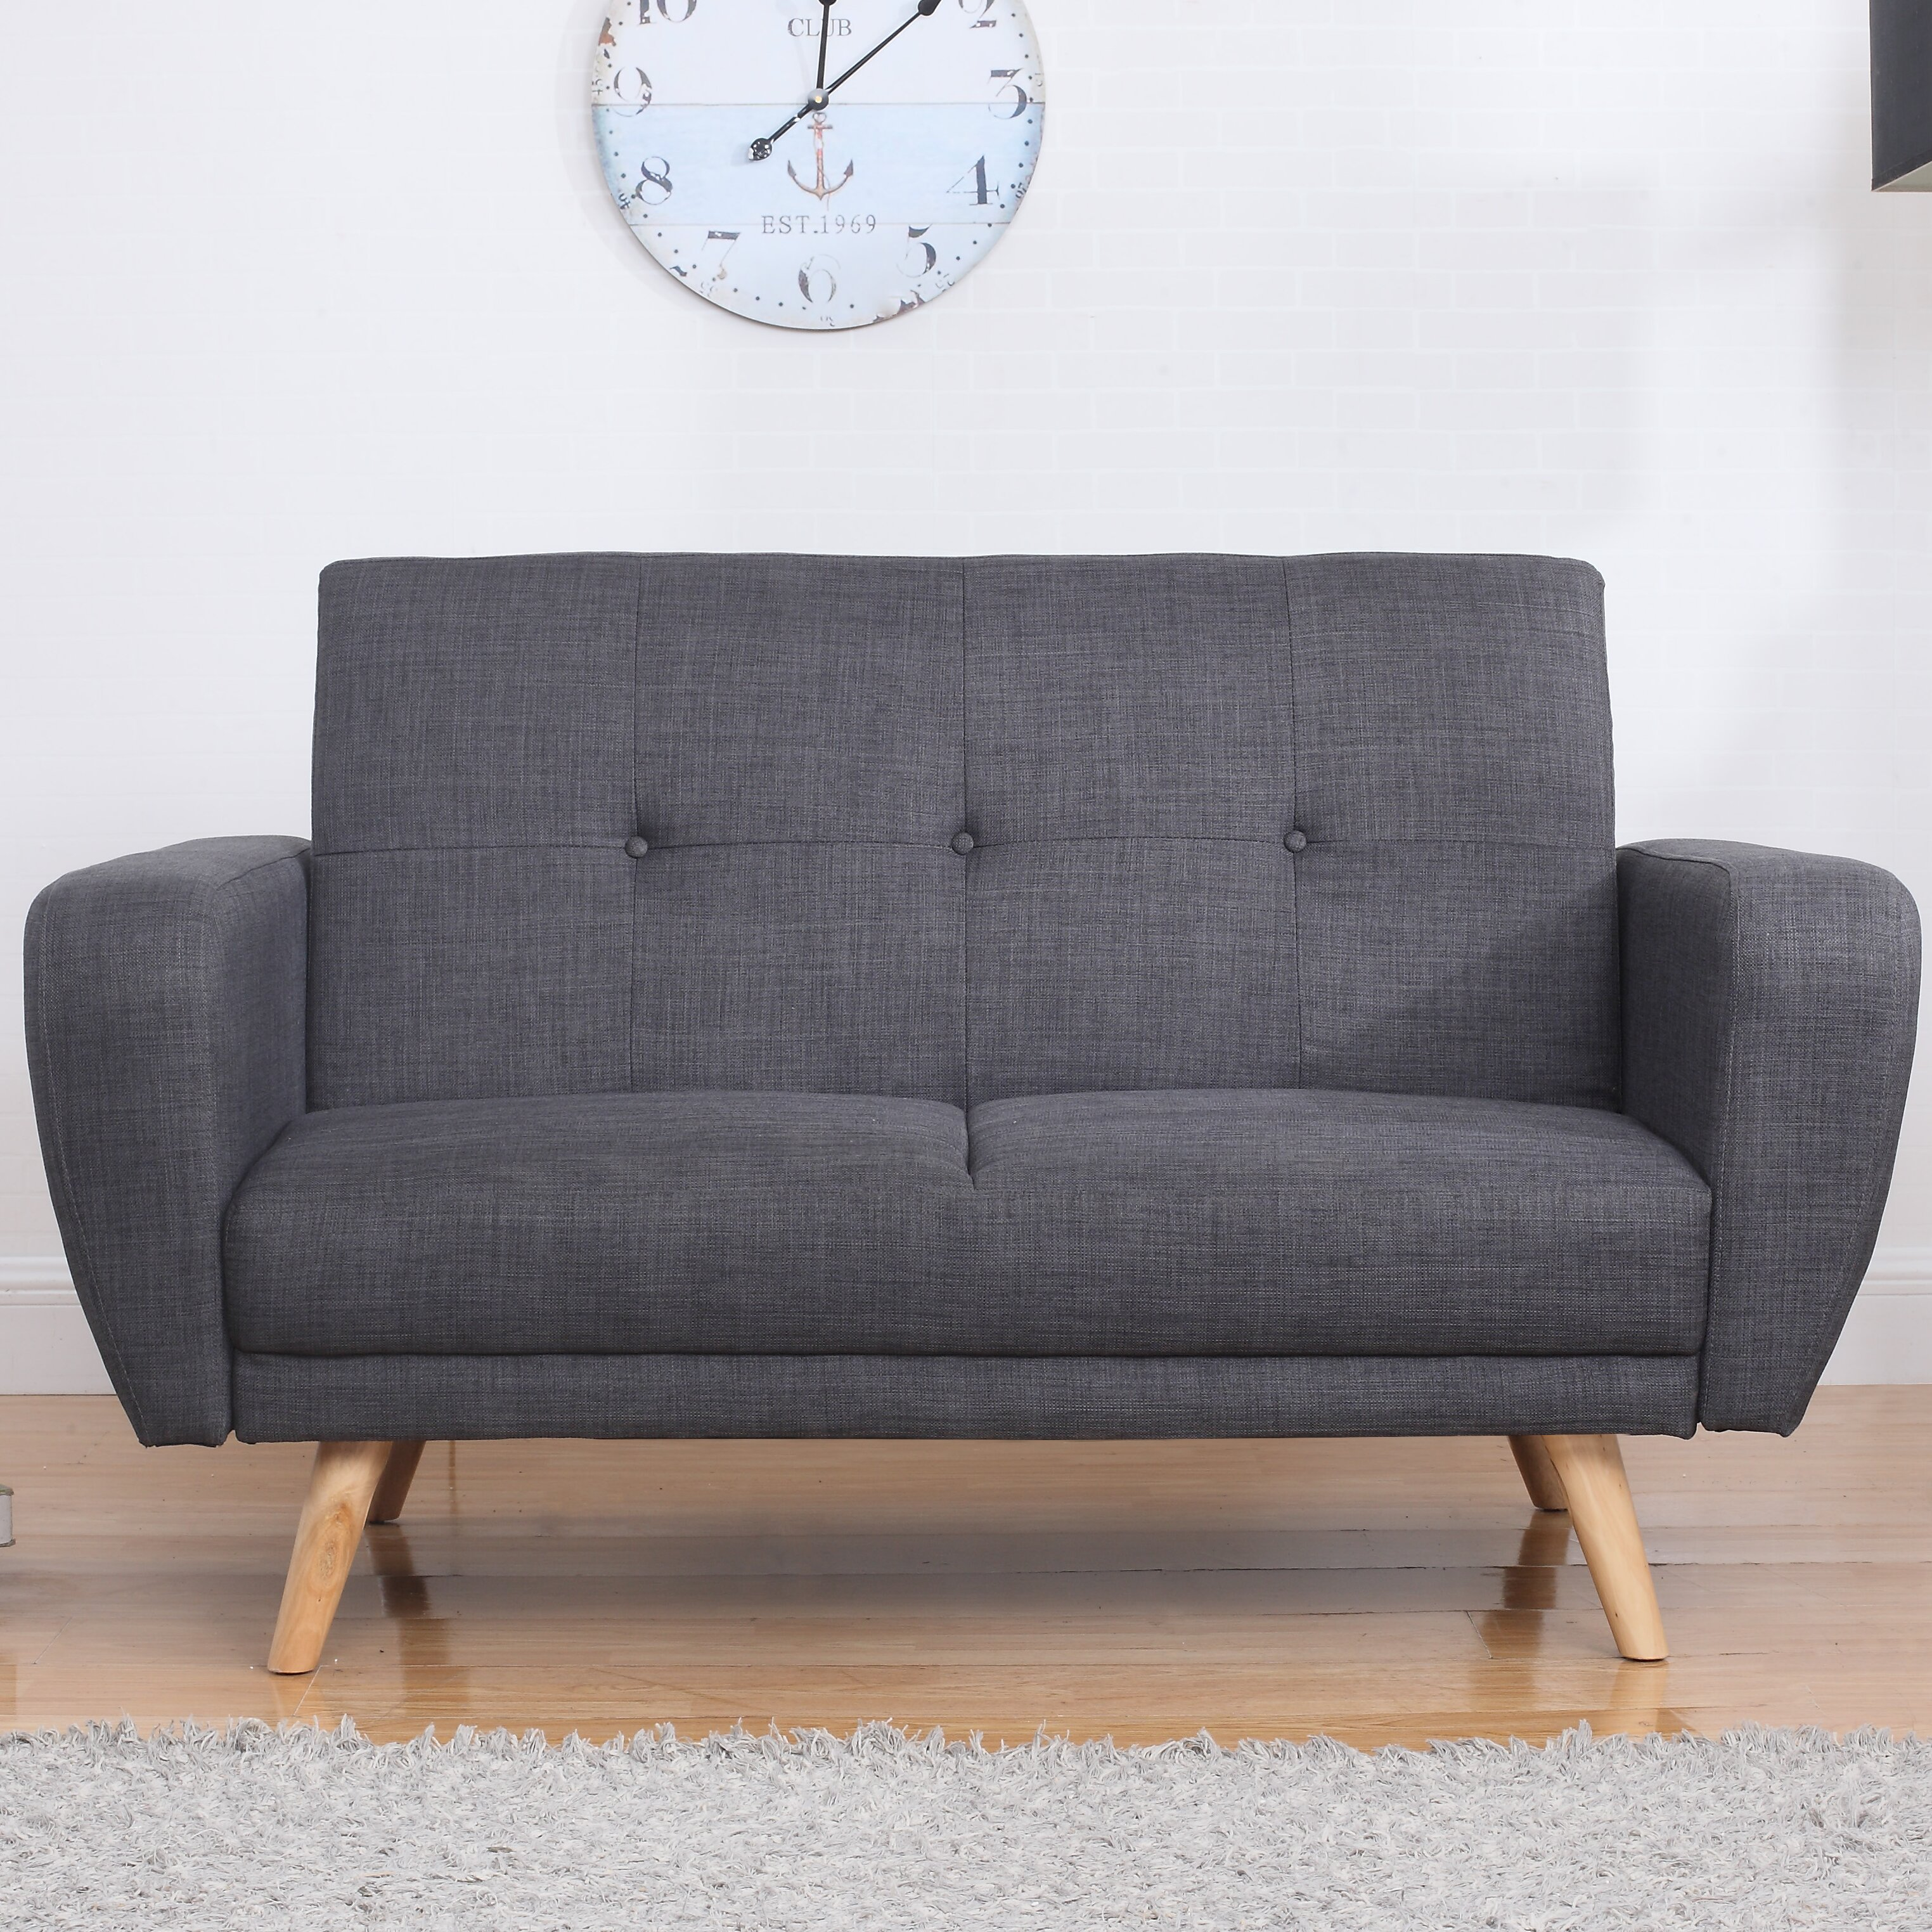 modern sofa beds clic clacs sofa the honoroak. Black Bedroom Furniture Sets. Home Design Ideas